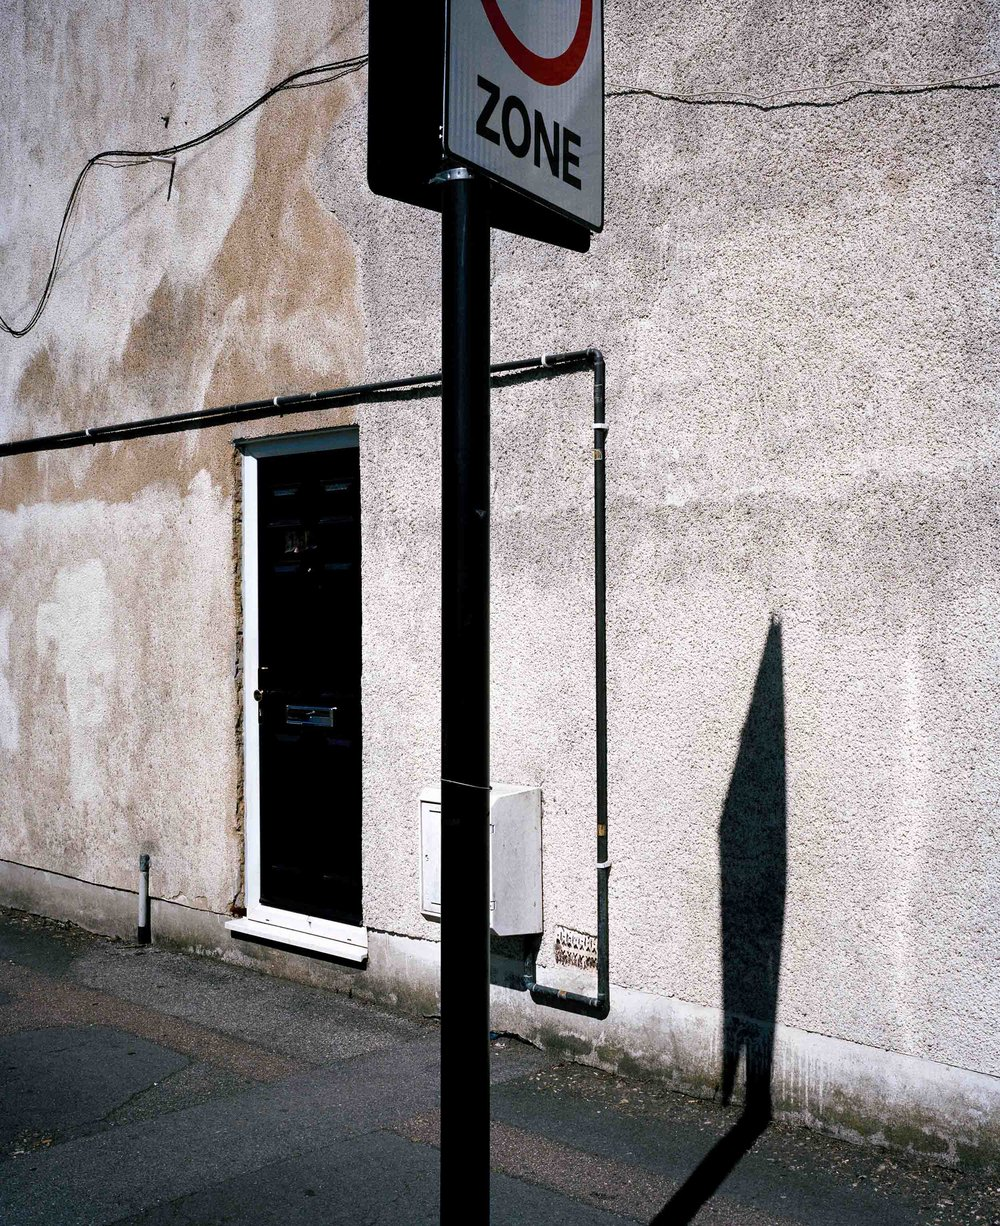 6-blighty-england-london-sam-gregg-photography.jpg